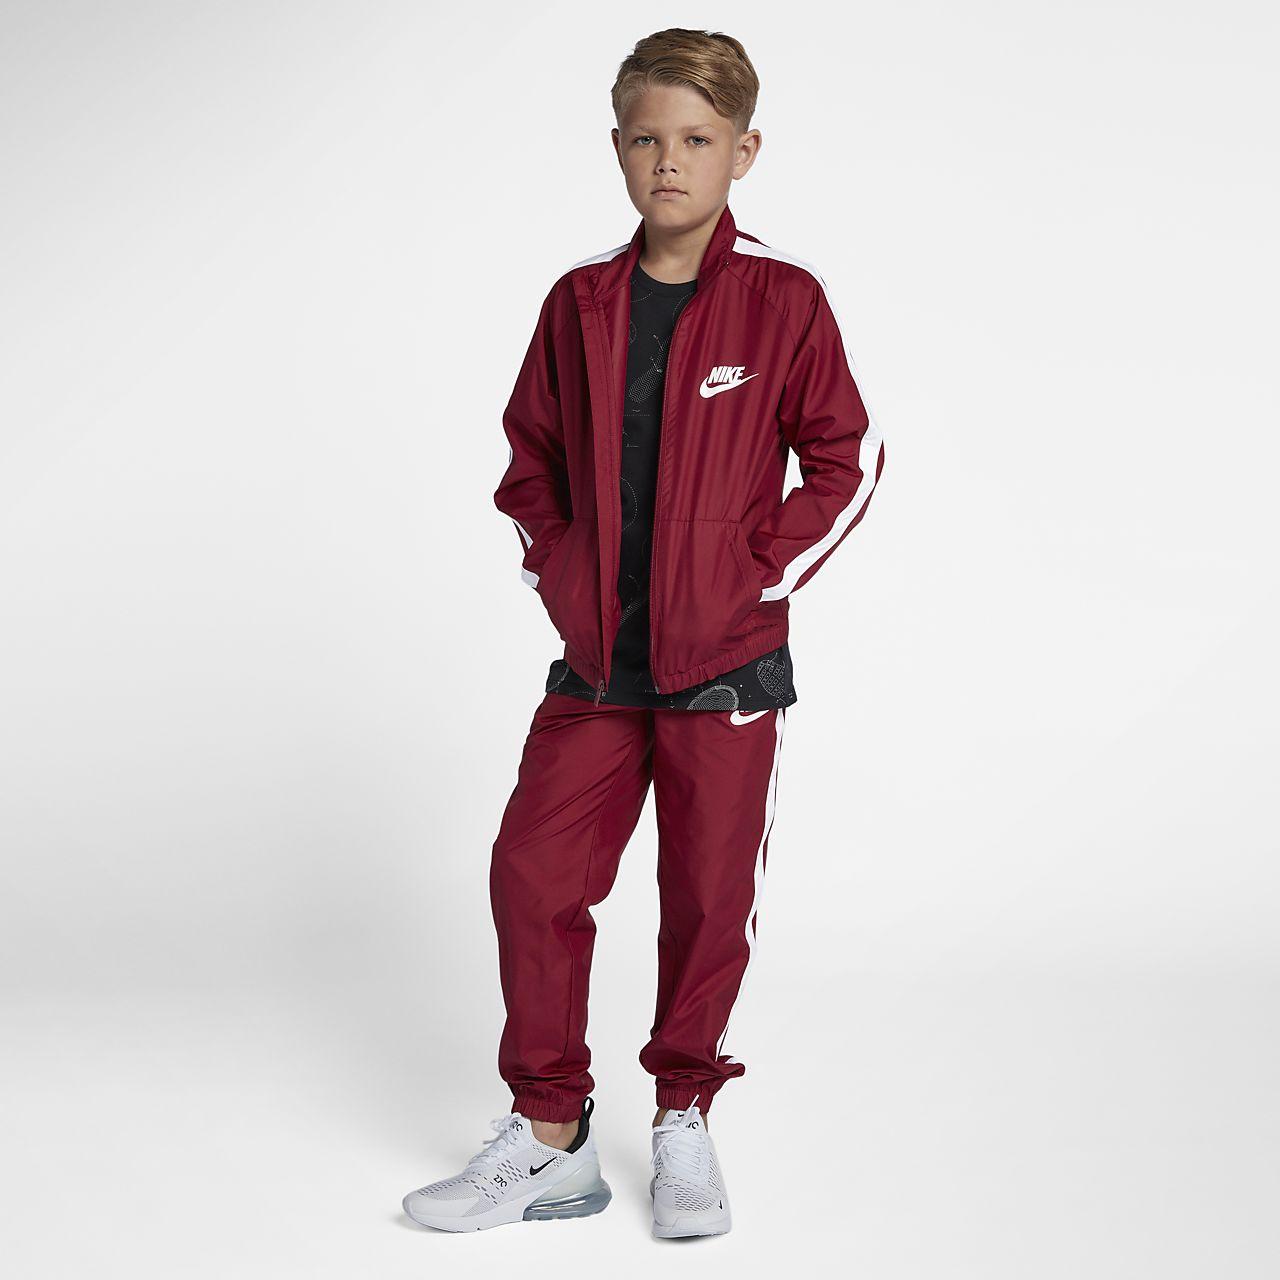 Nike Sportswear Older Kids Boys Tracksuit Nikecom Bg-9660